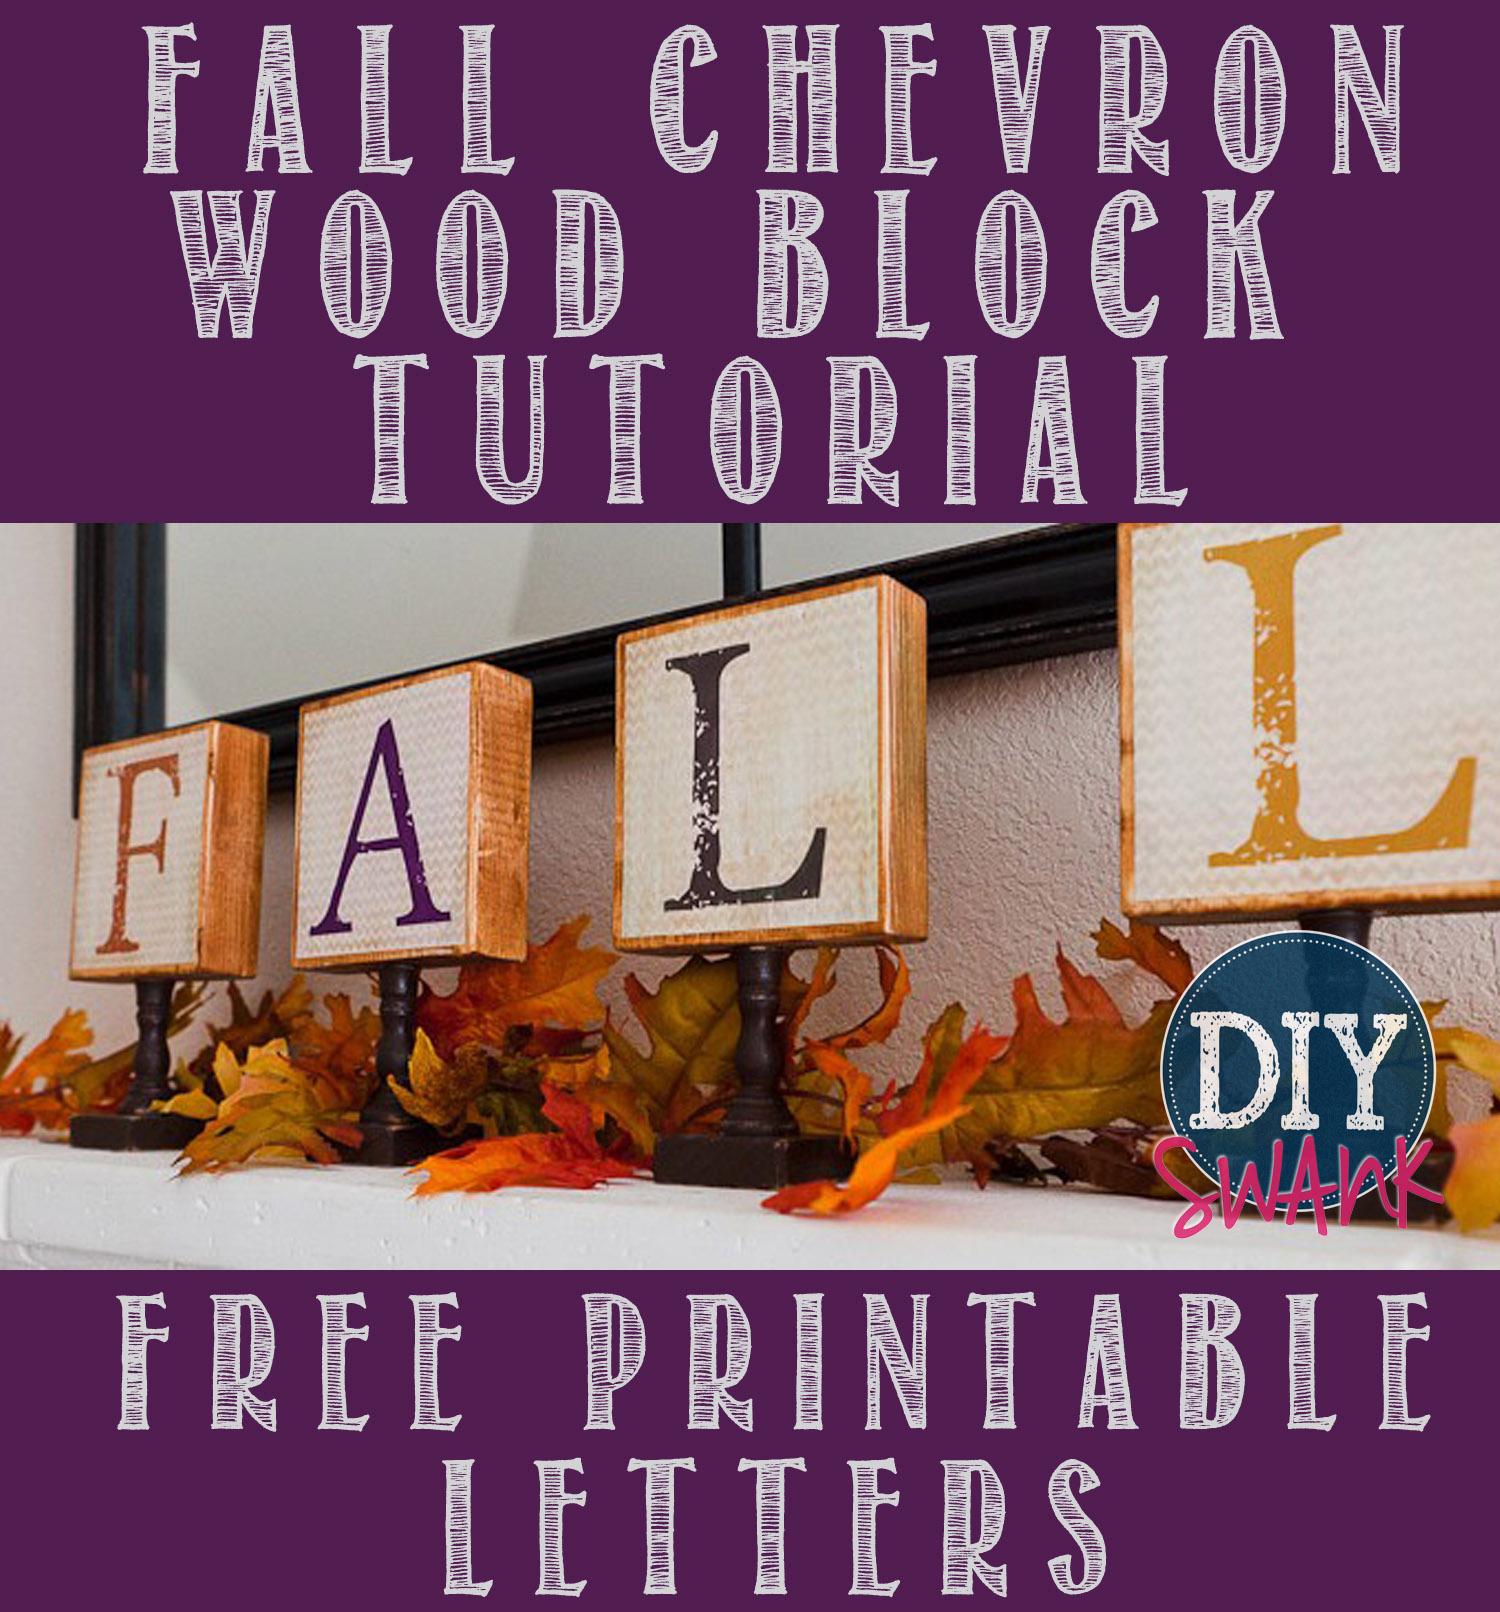 Diy Fall Chevron Wood Block Letters - Free Printable | Diy Swank - Diy Swank Free Printable Letters